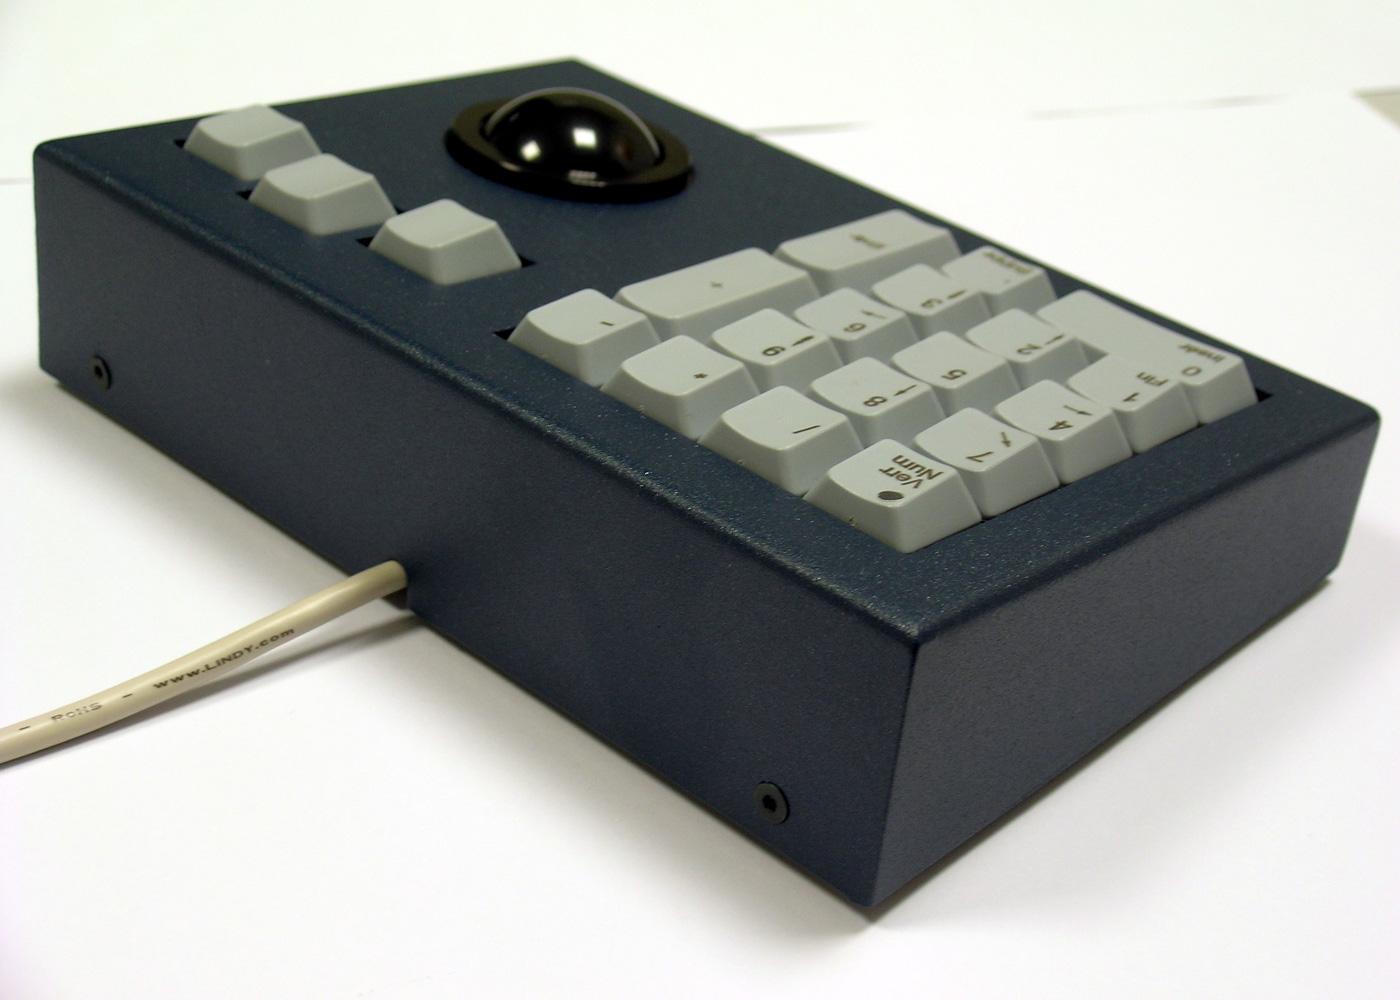 Clavier industriel 17 touches en boitier de table avec trackball 38mm